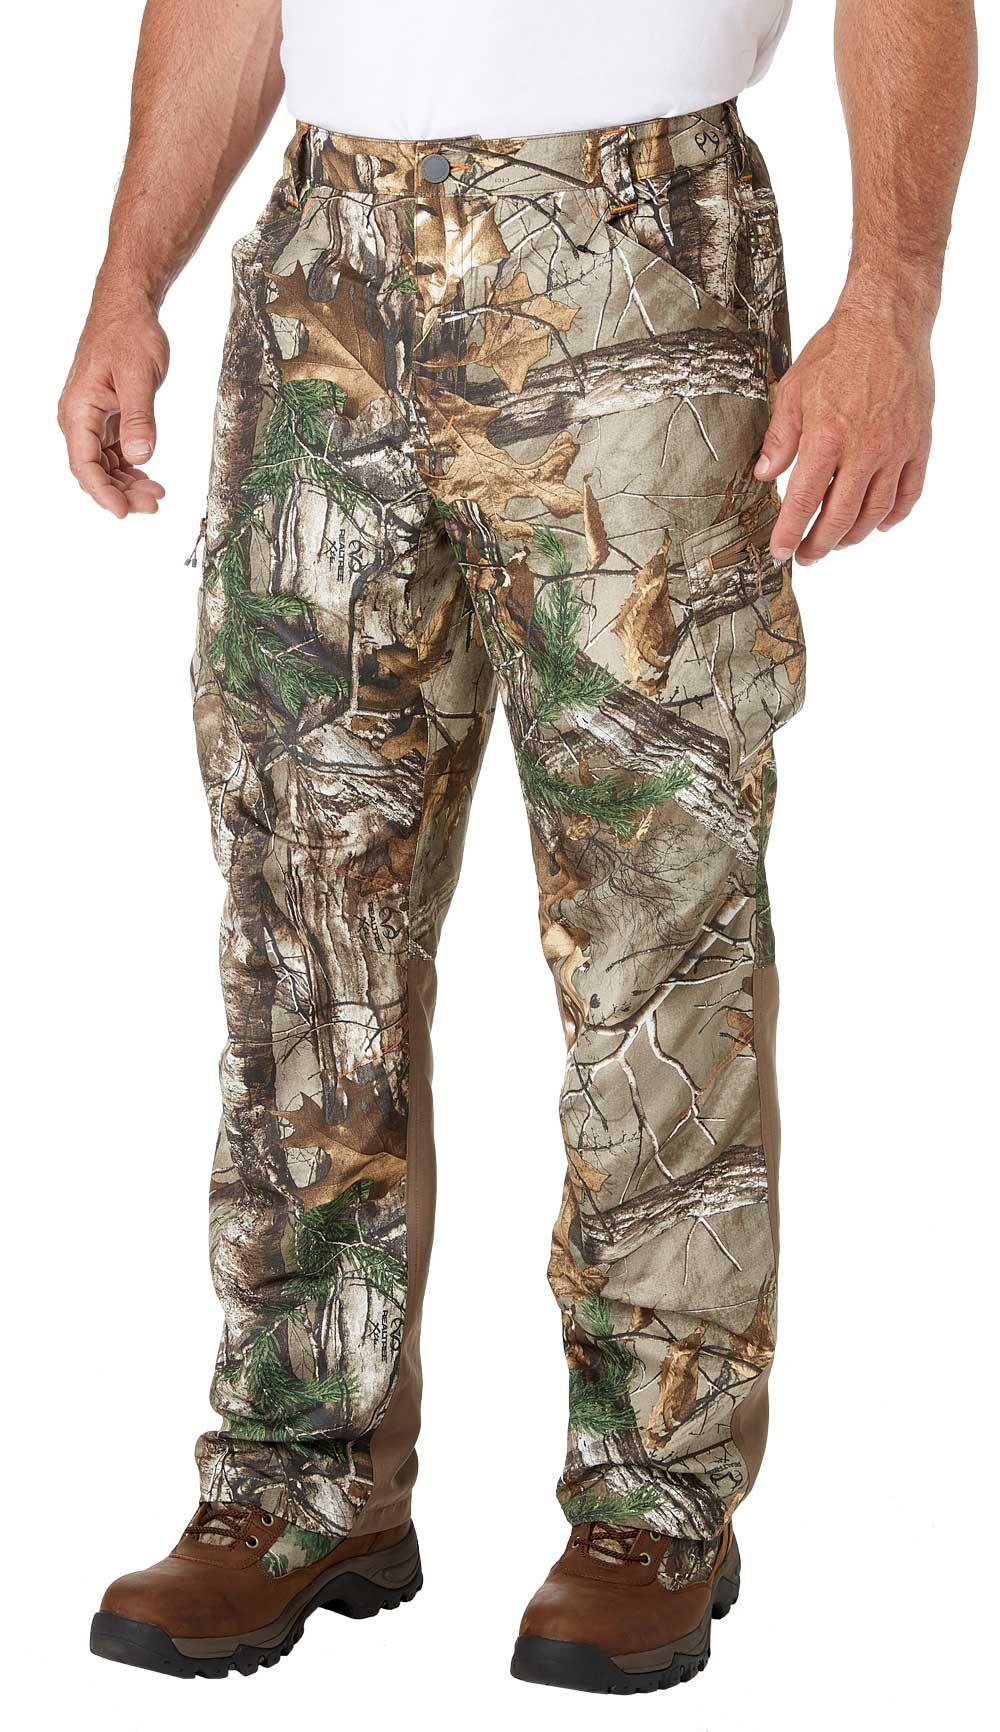 Field & Stream Men's Every Hunt Lightweight Cargo Hunting Pants, Size: XXXL, Brown thumbnail